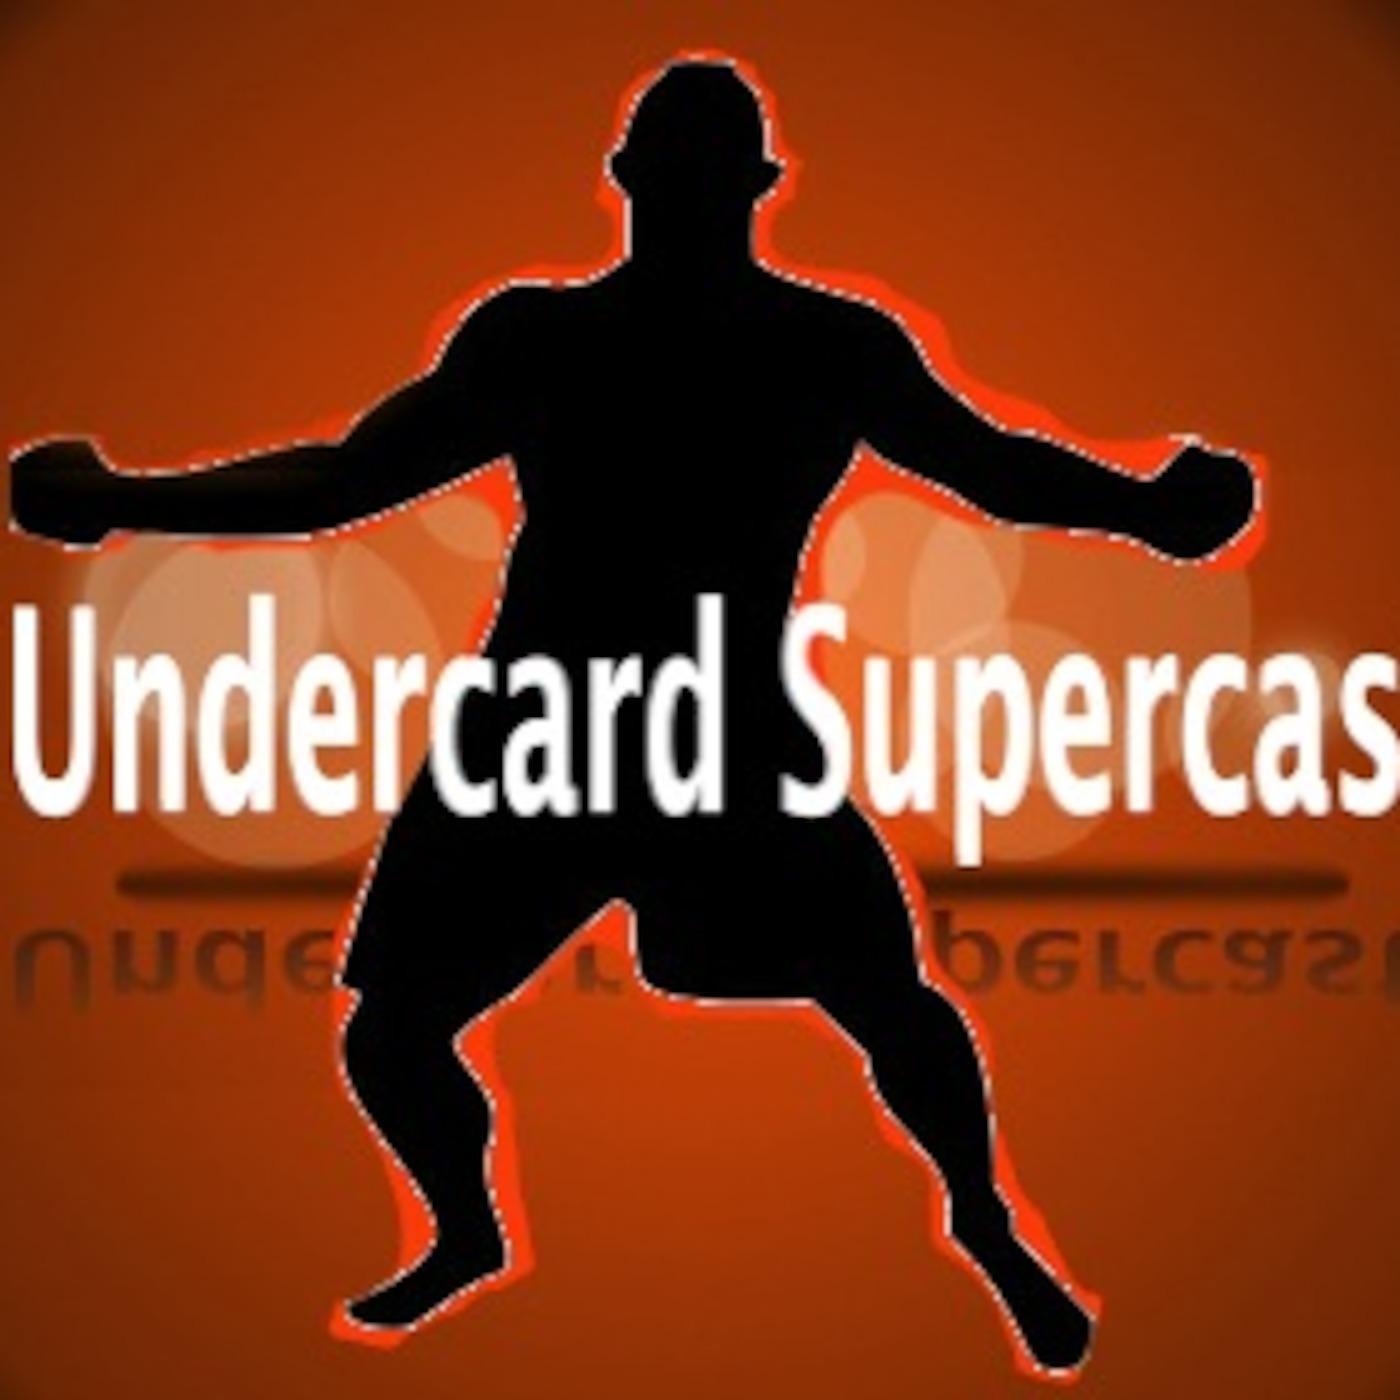 Undercard Supercast